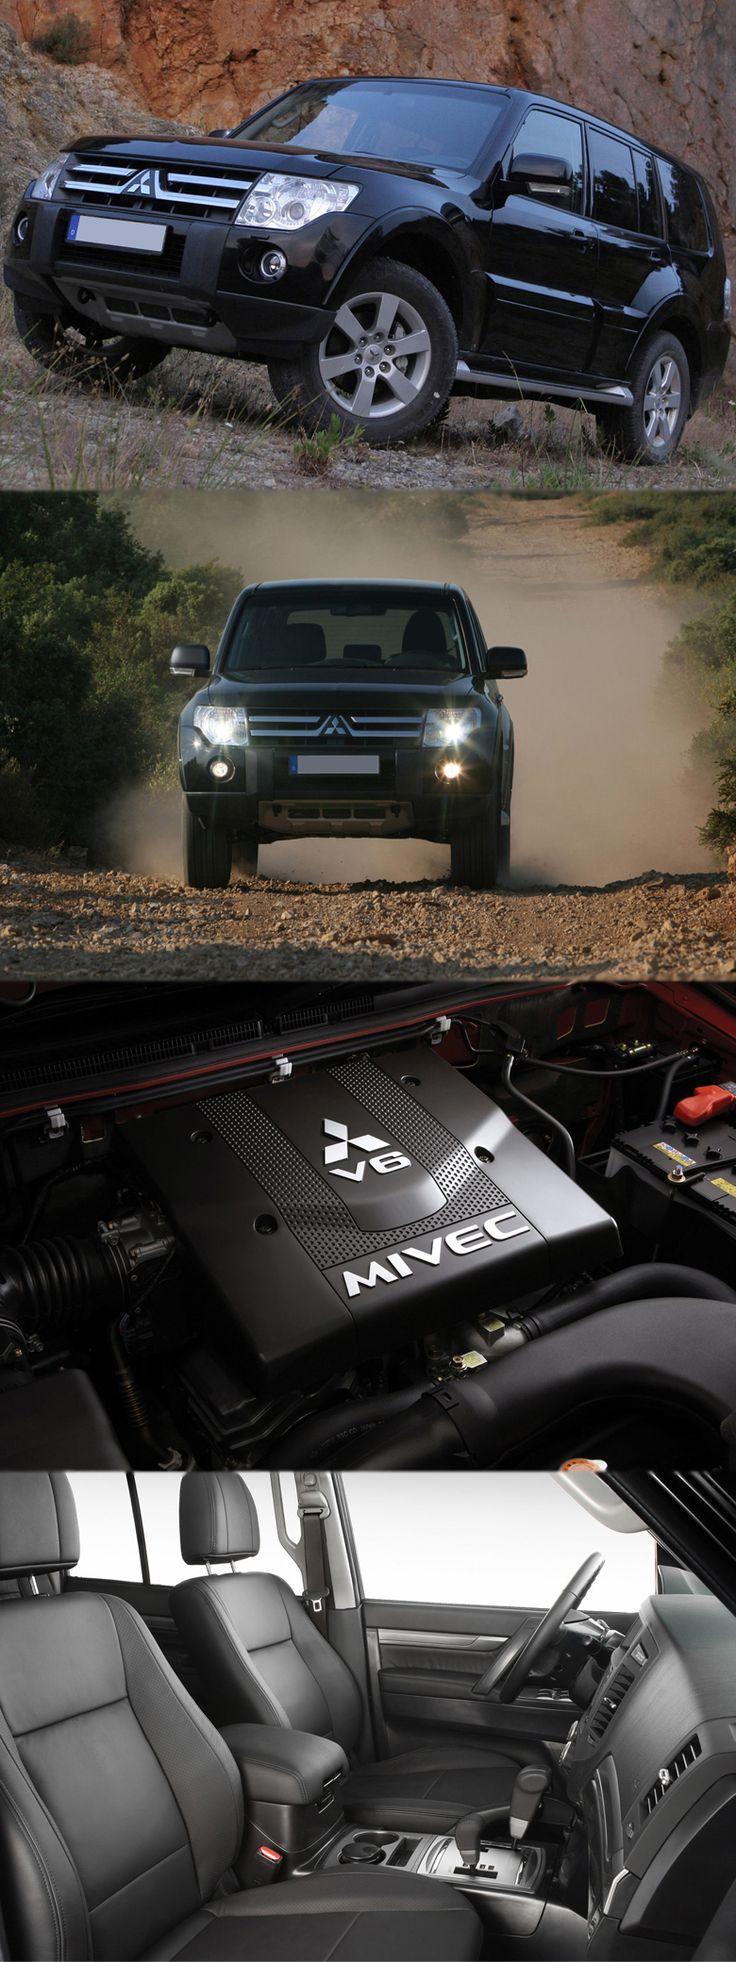 Mitsubishi pajero a big family vehicle visit link for more details https